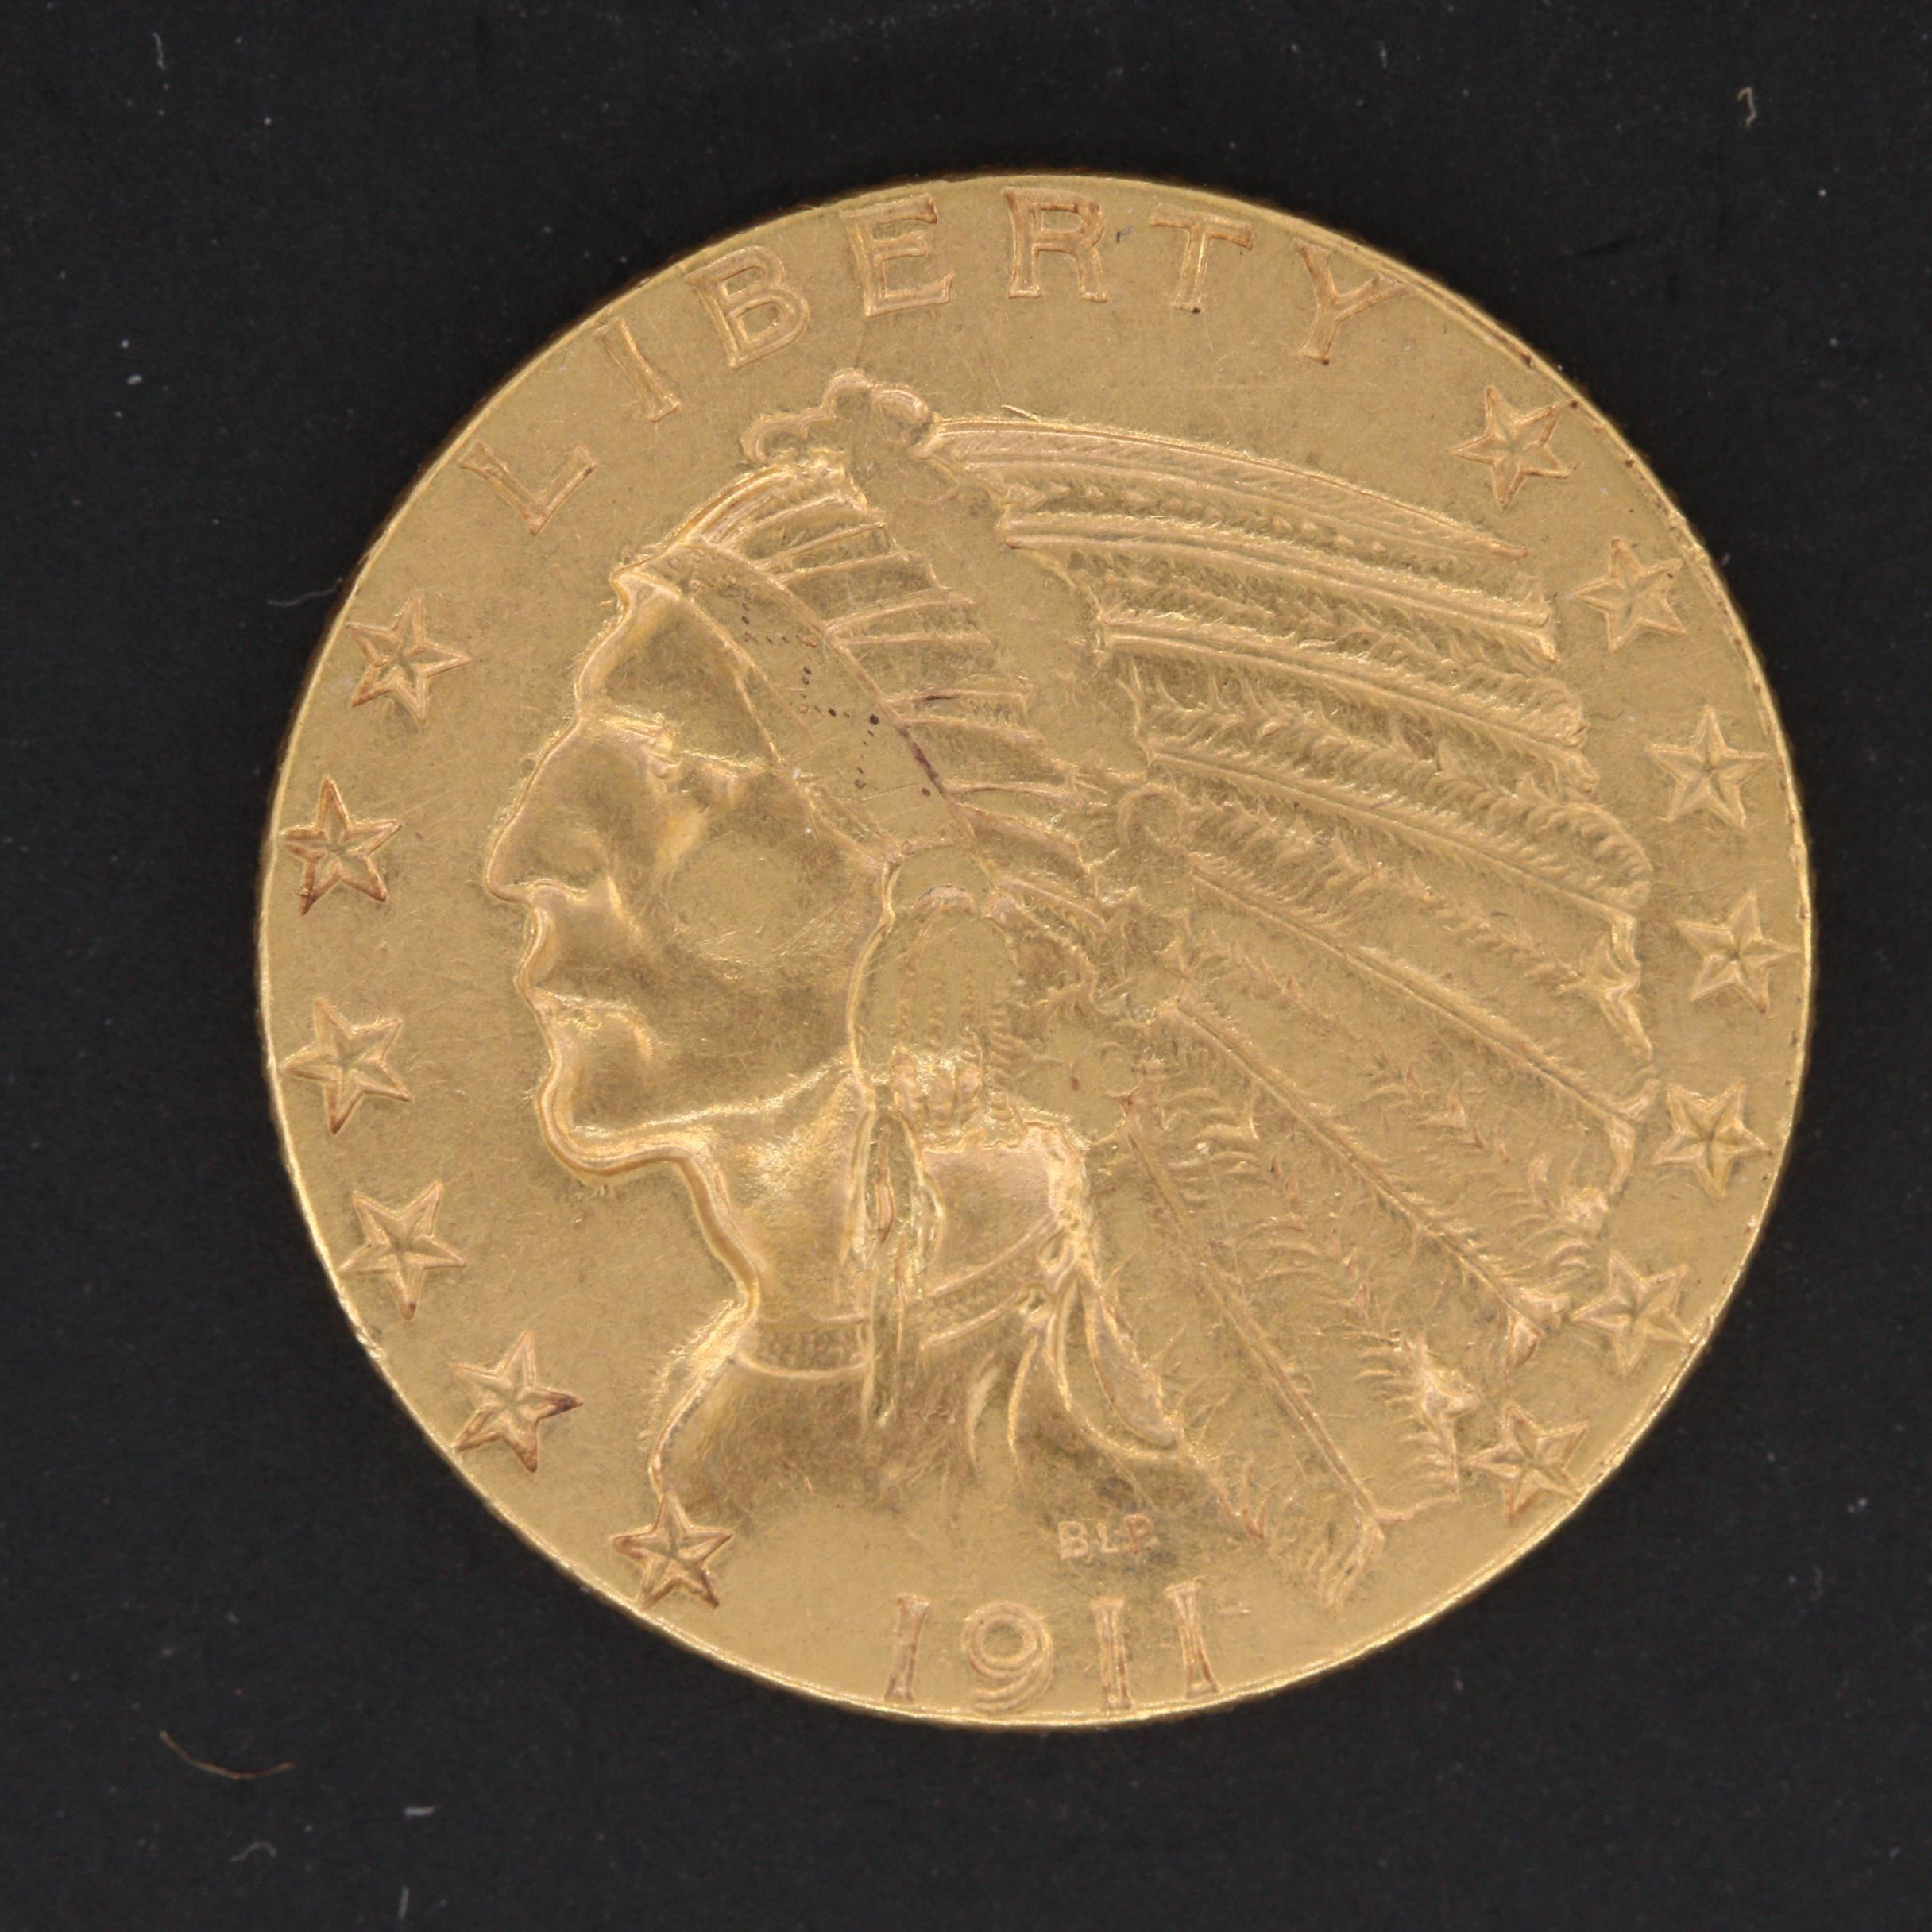 1911 Indian Head $5 Half Eagle Gold Coin